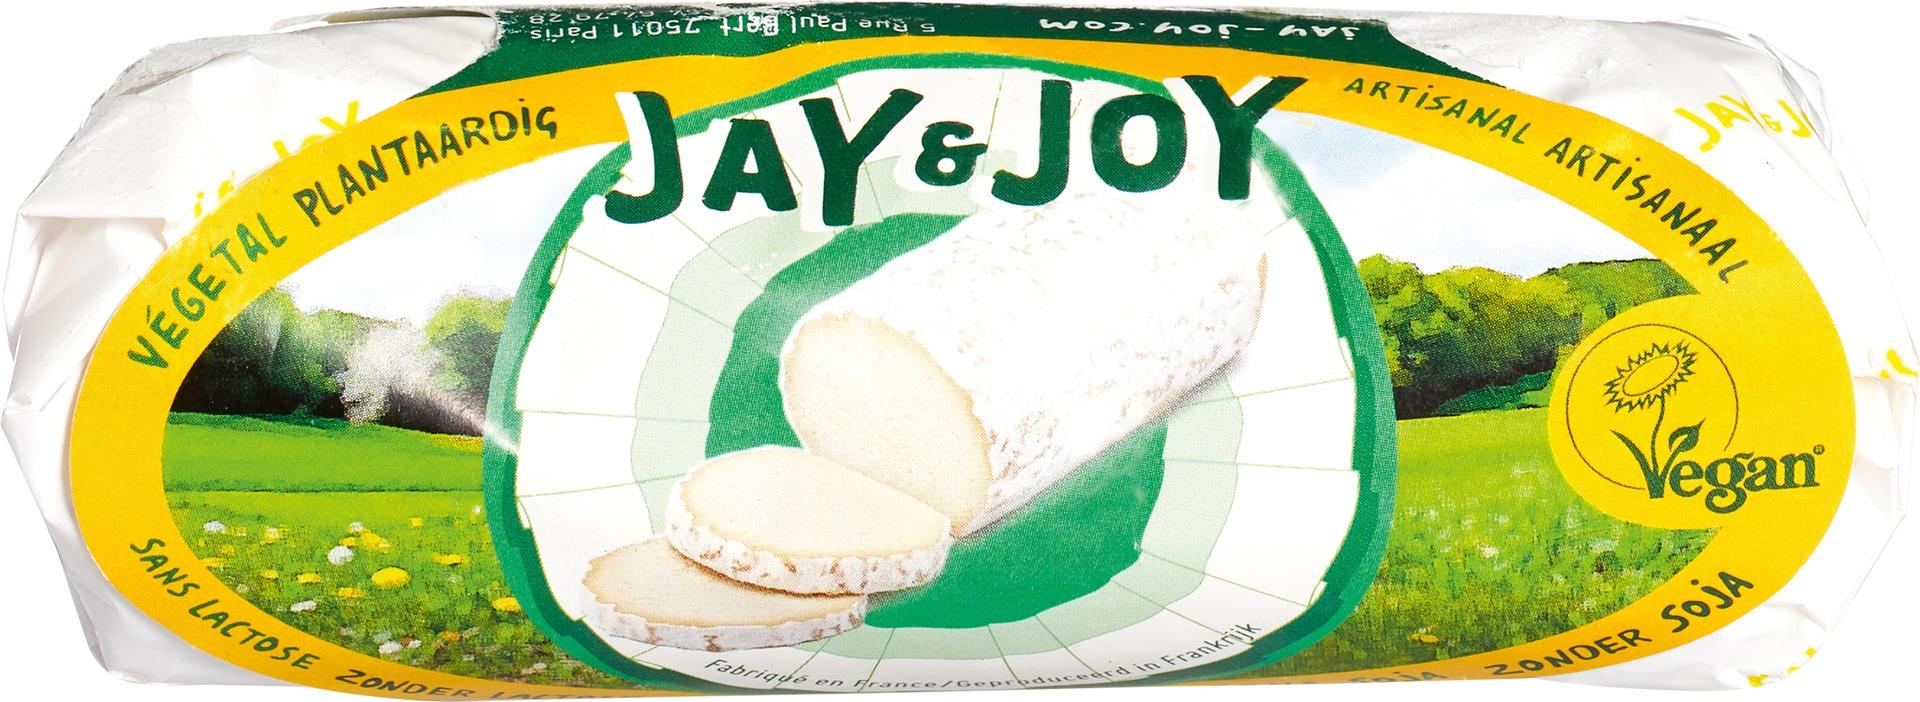 Biologische Jay & Joy Jil vegan geitenkaas 90 gr